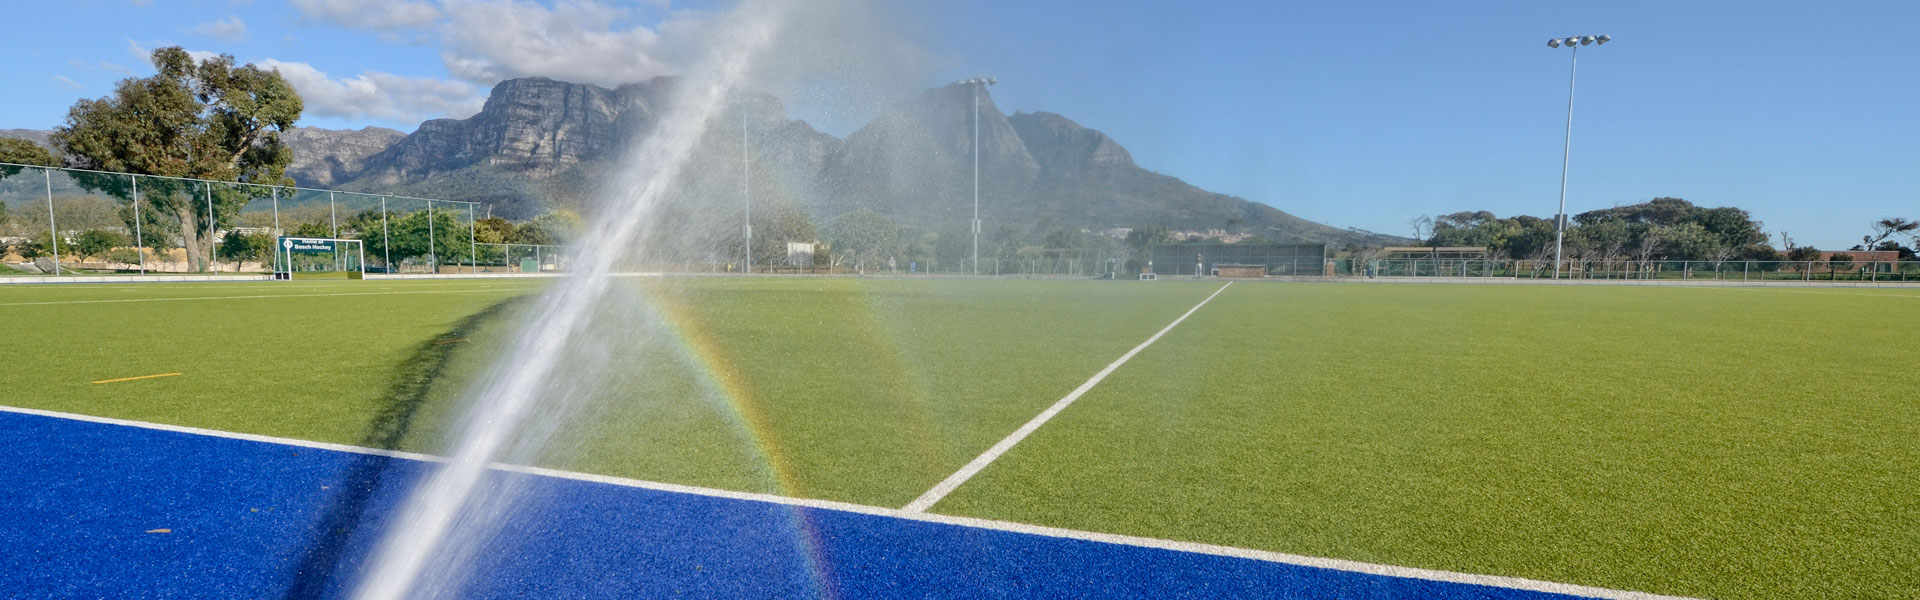 Turfmanzi Irrigation - Soccer Field Irrigation